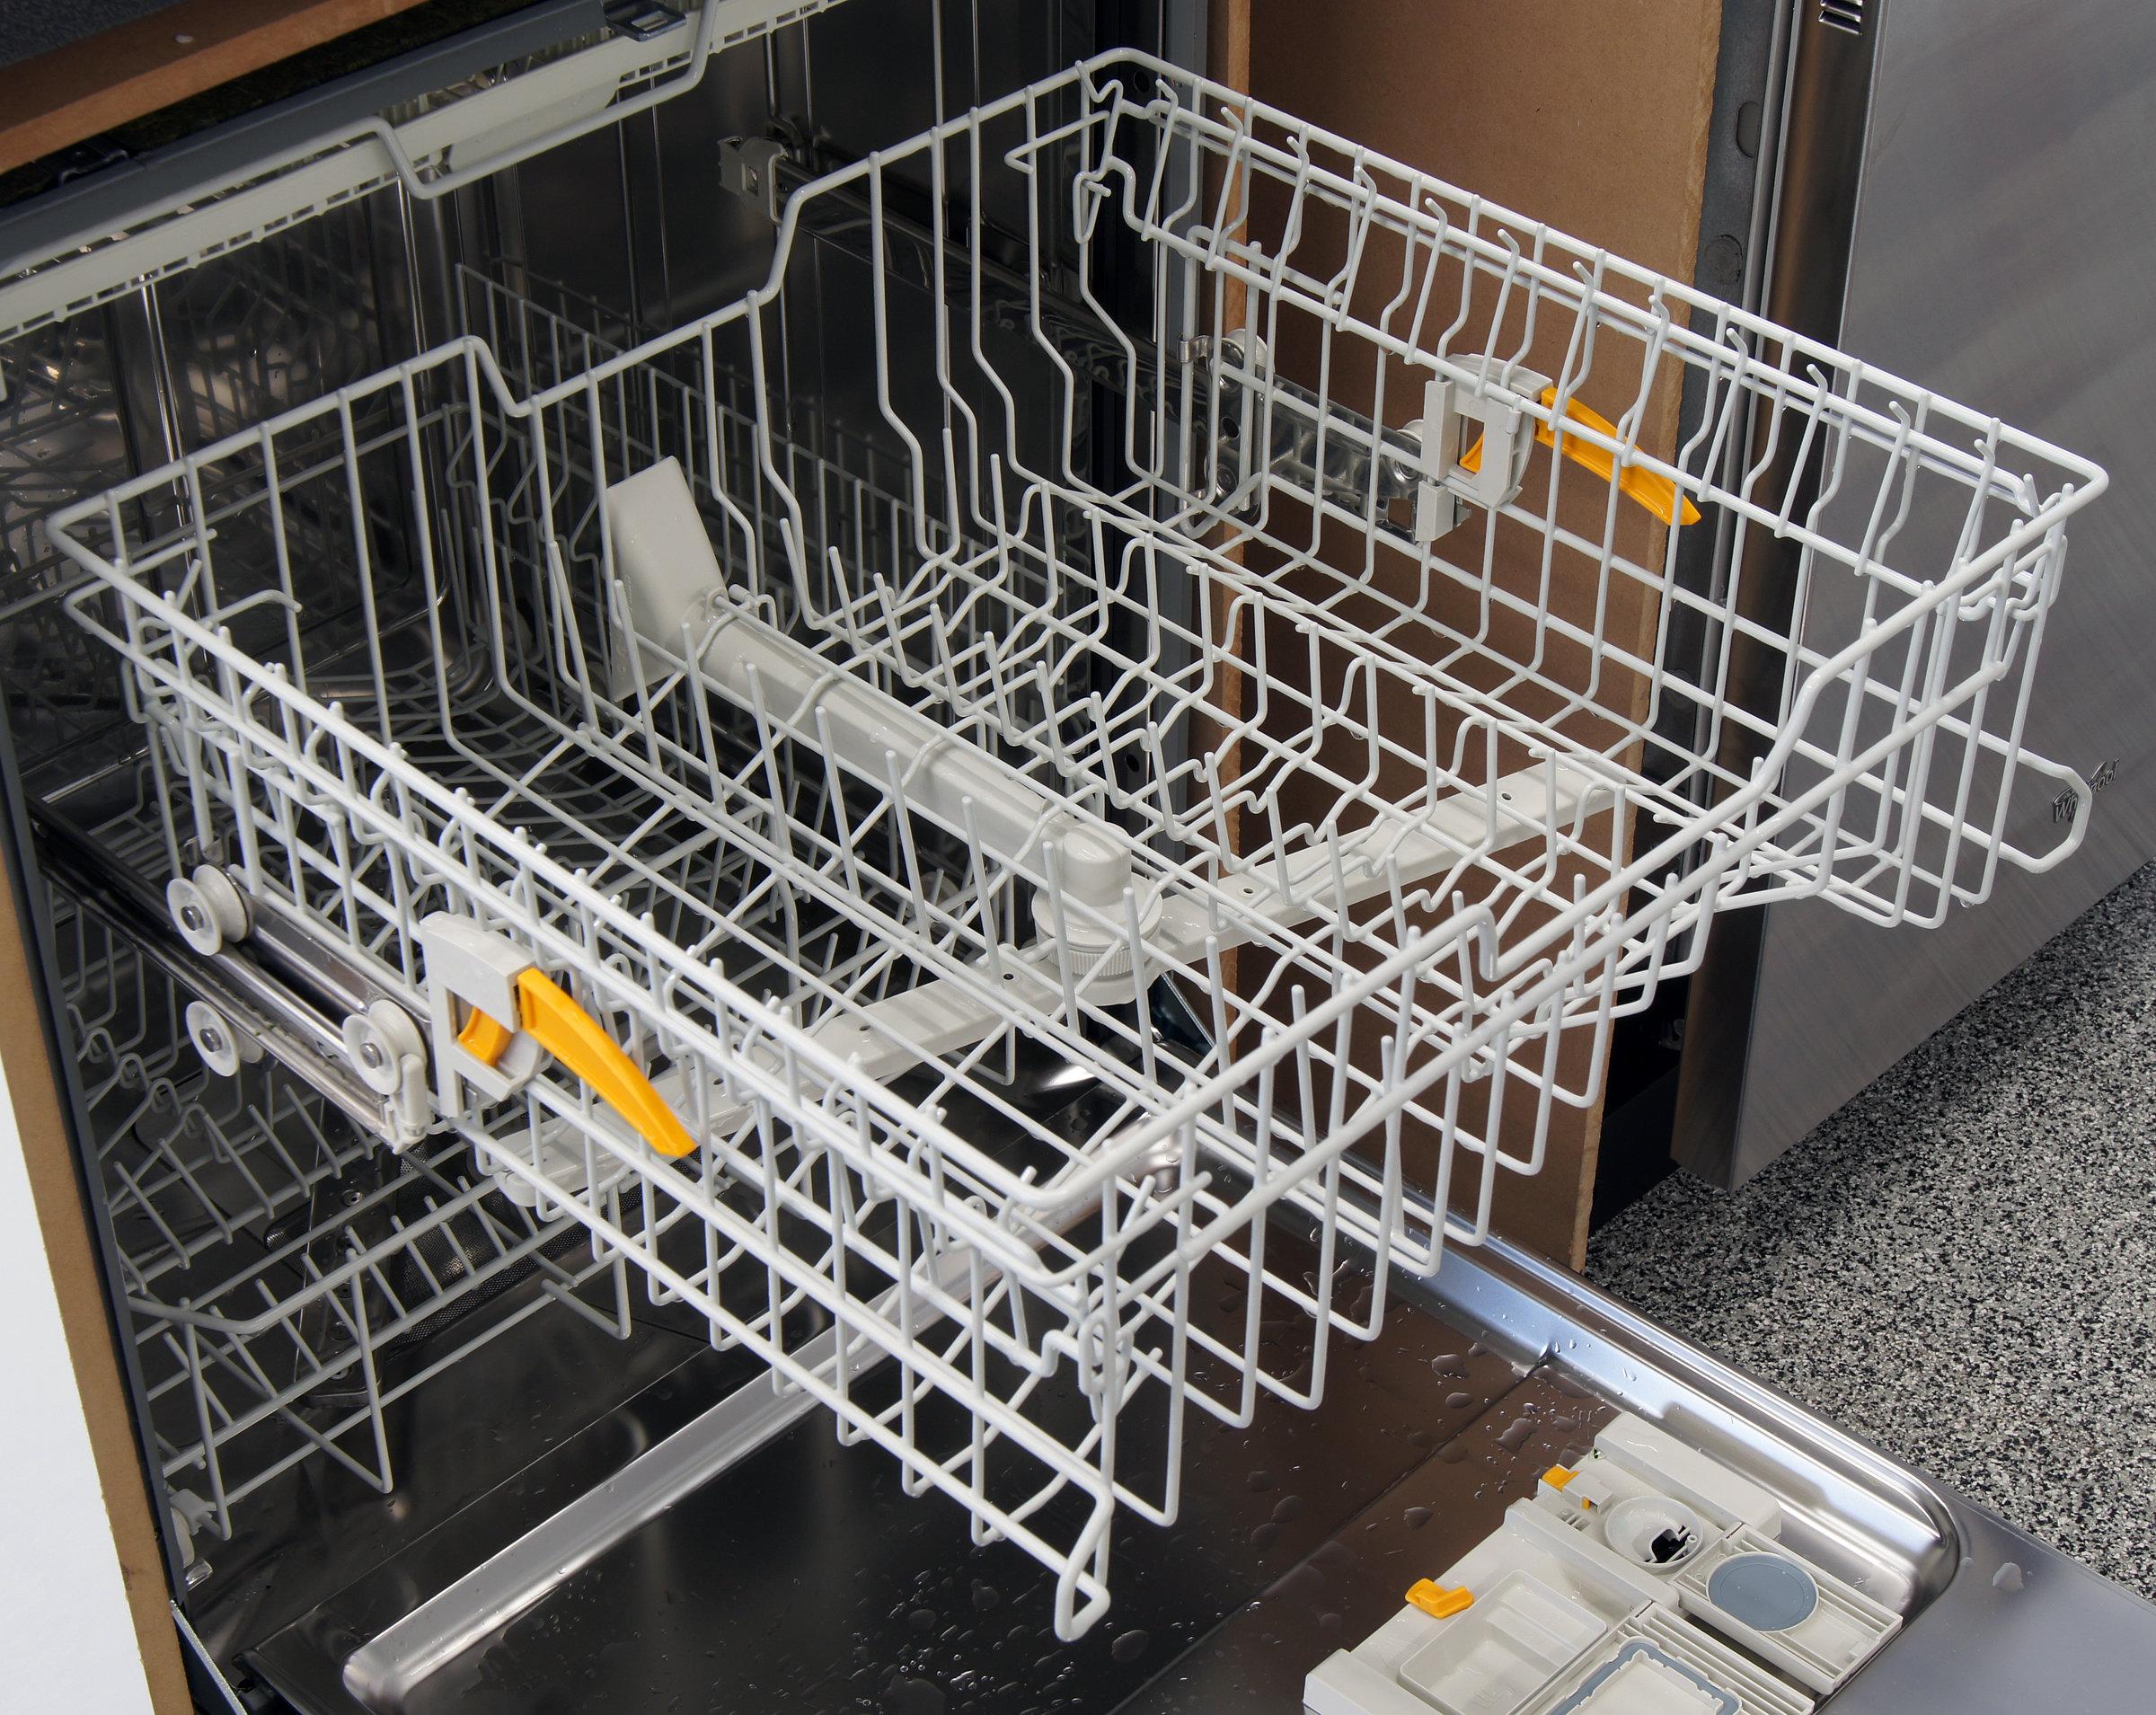 Miele Futura Classic Series G4225scu Dishwasher Review